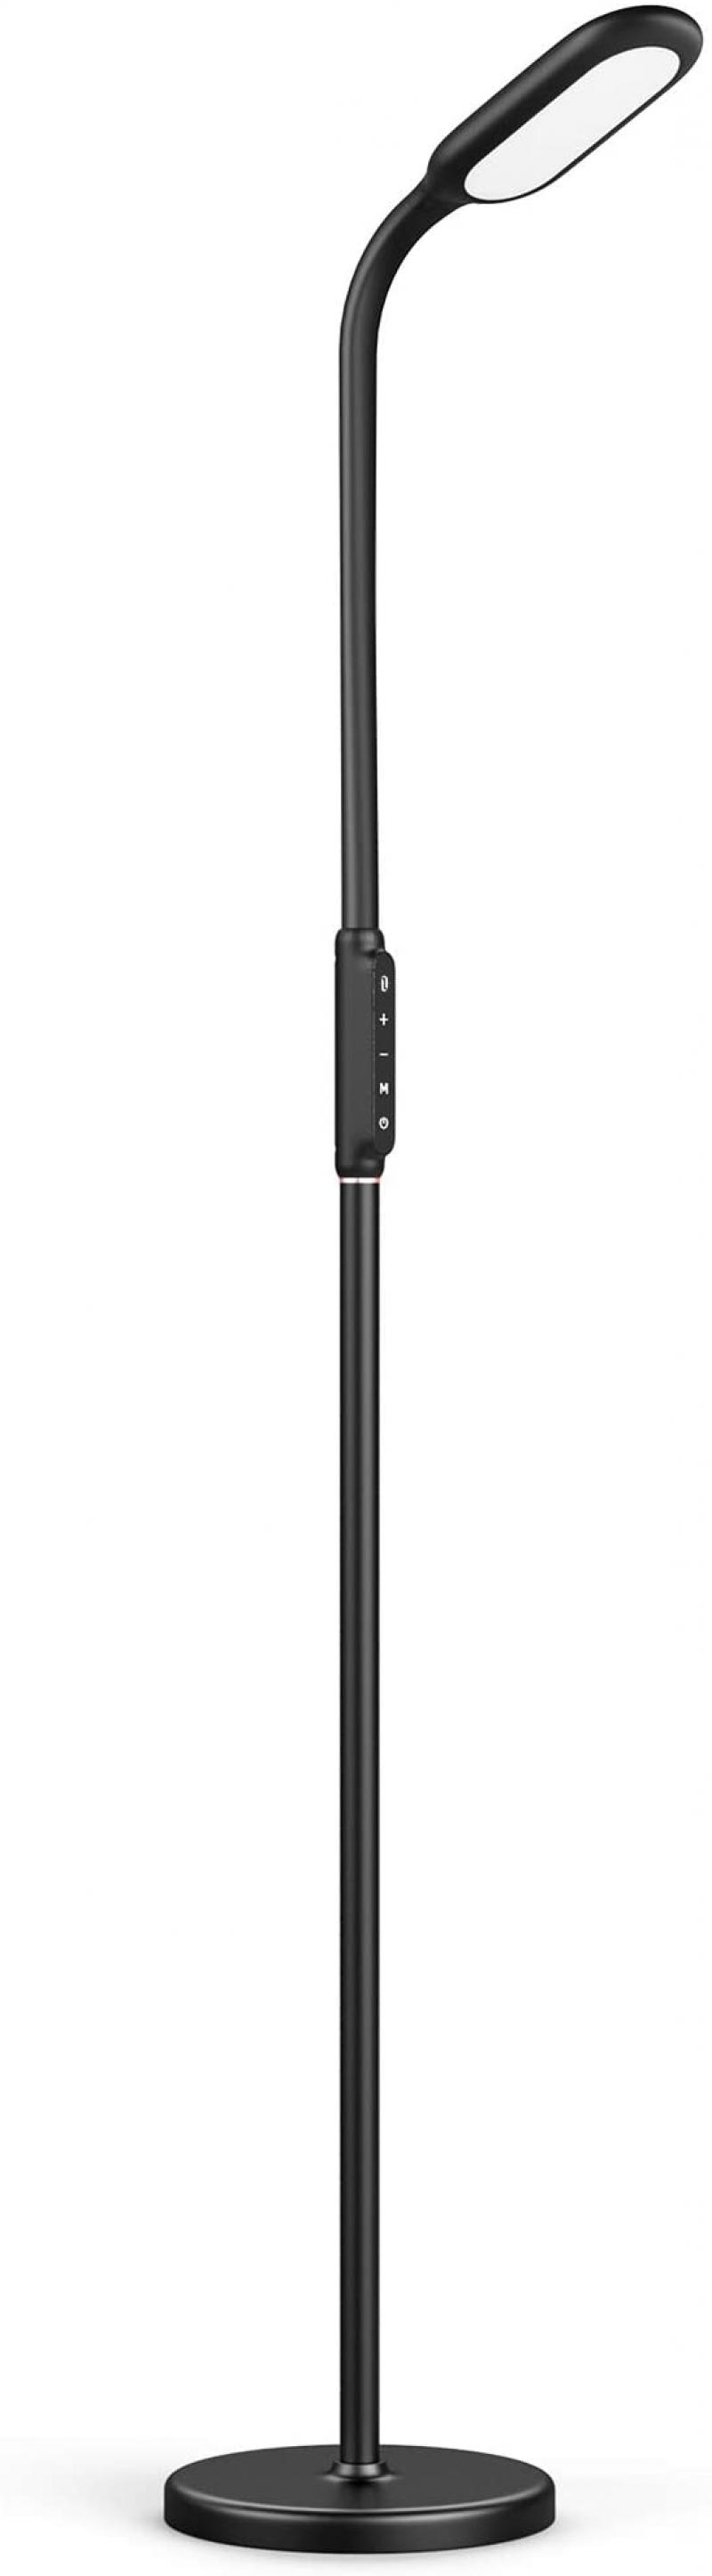 ihocon: TaoTronics LED Floor Lamp 5 brightness levels & 3 colors, 1815 Lumens & 50,000 Hours落地燈(5種亮度/3種燈光顏色)